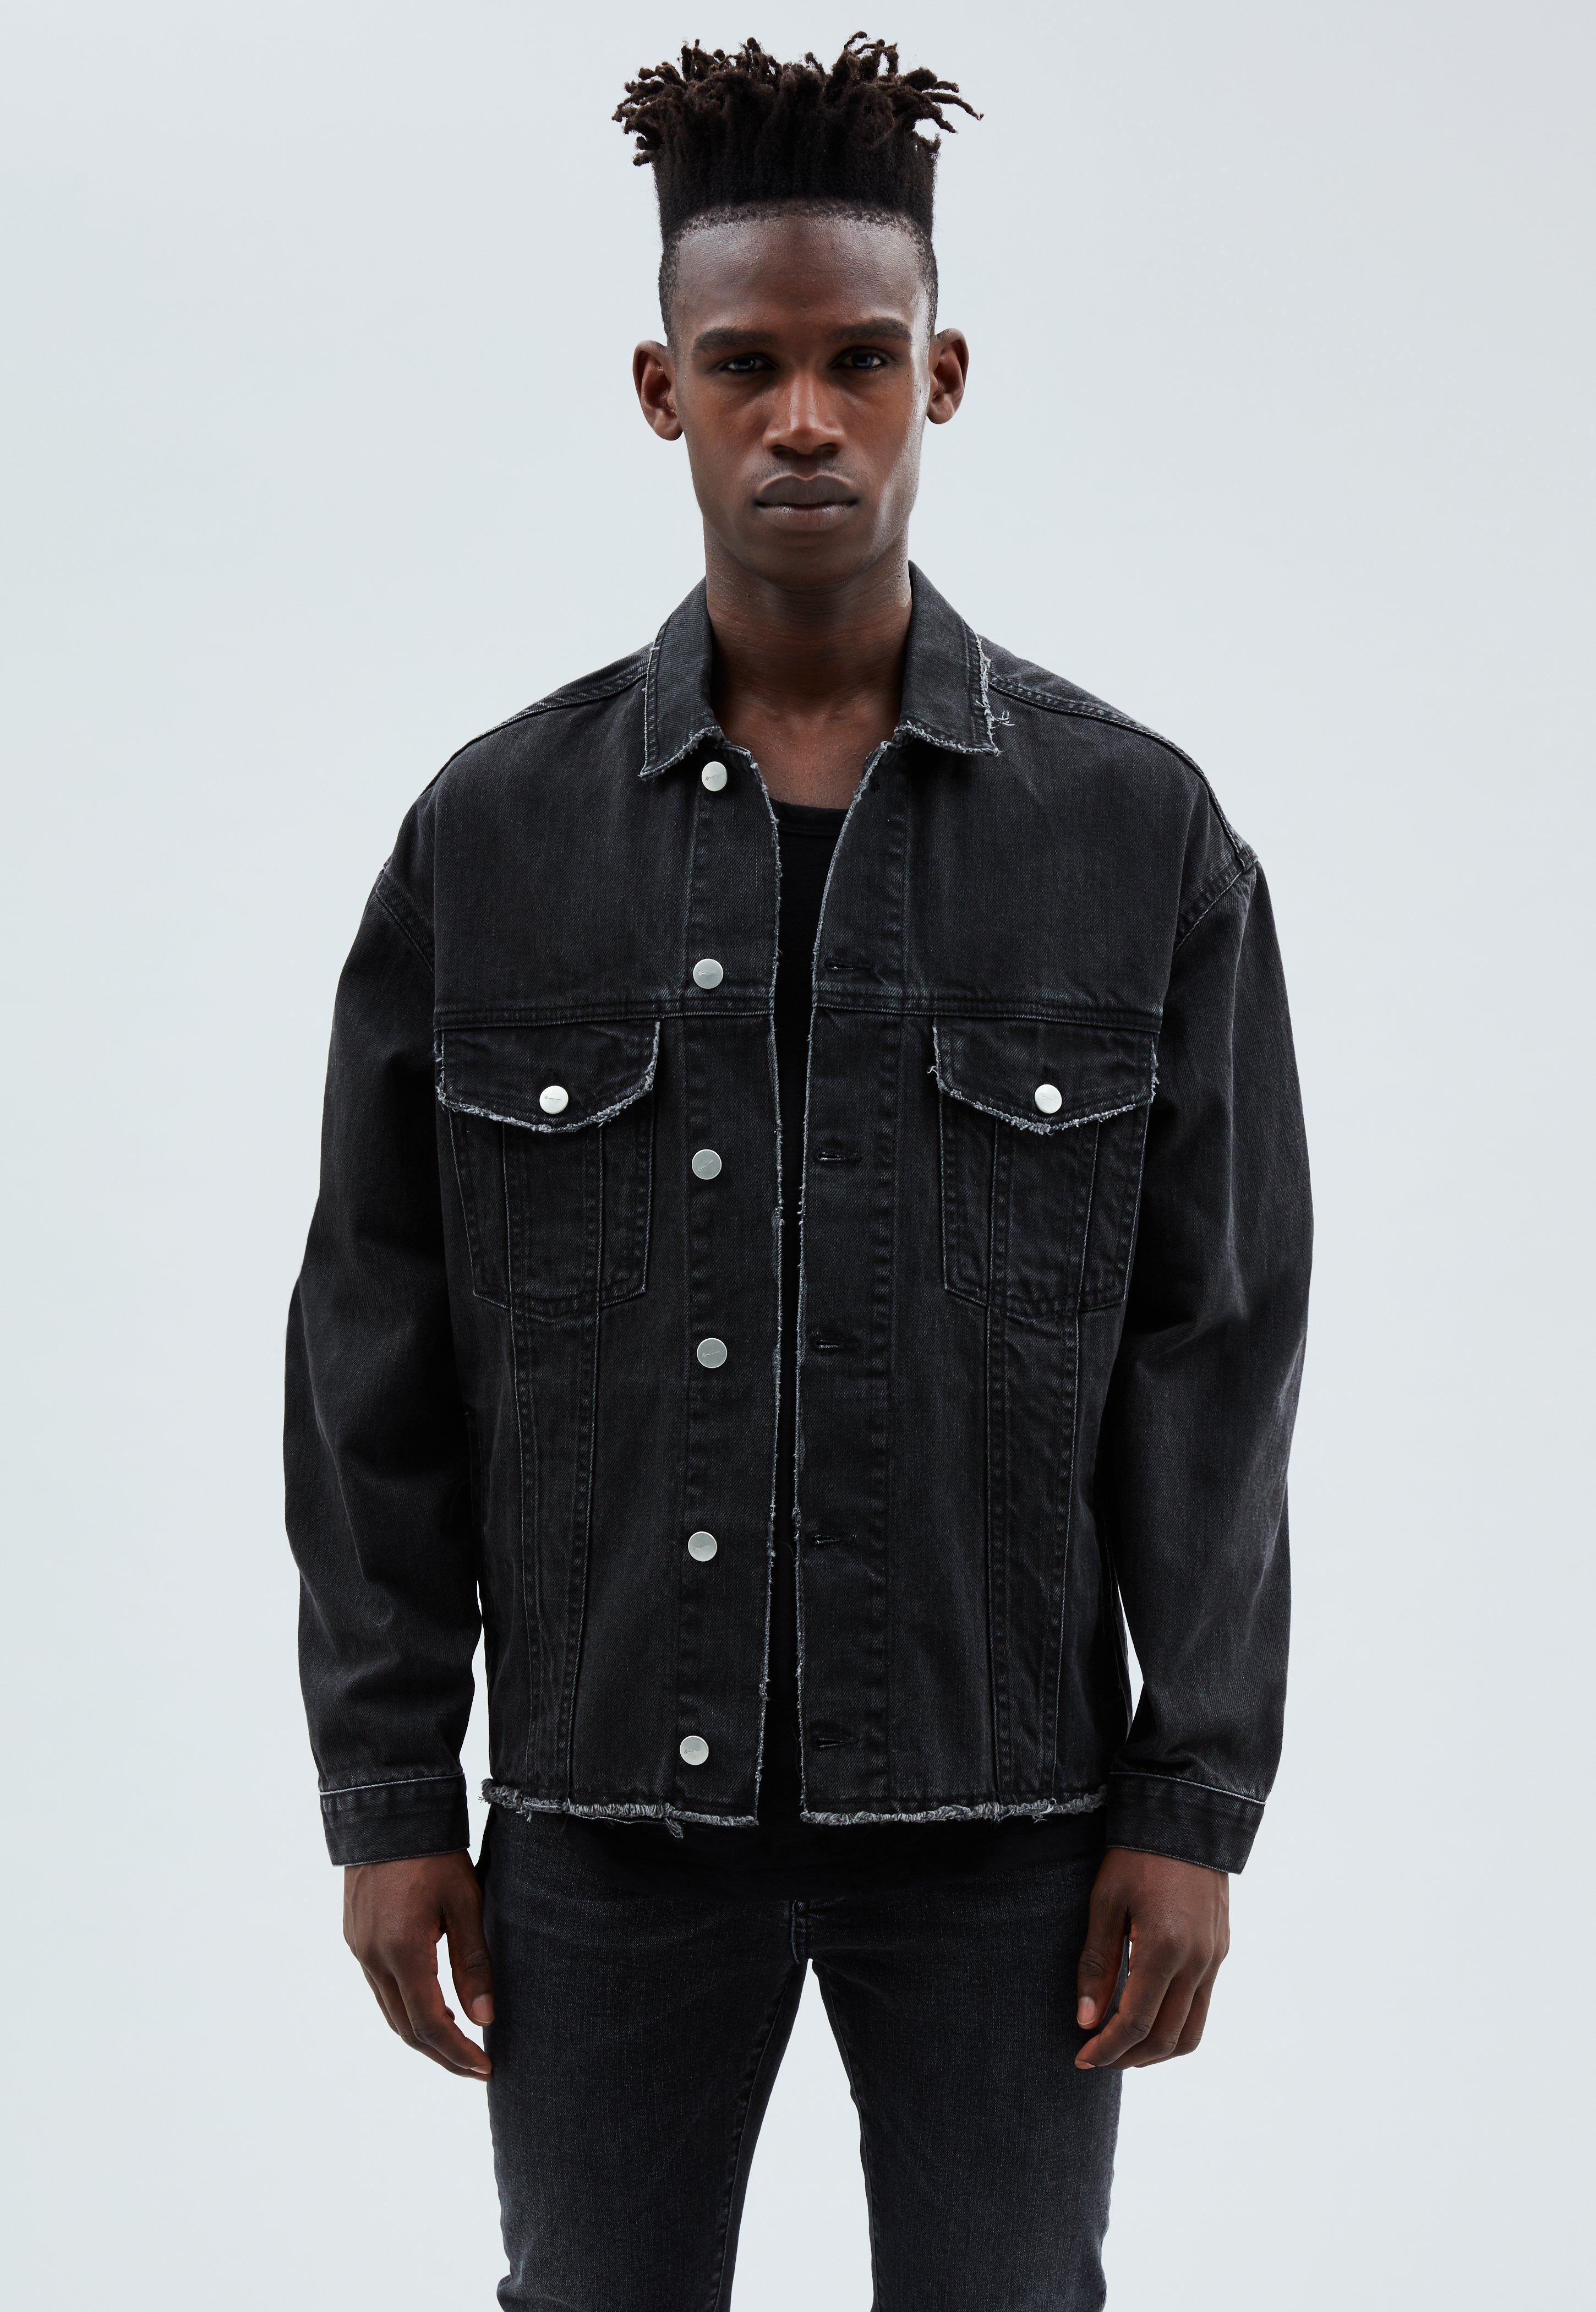 82d0d7b0e0f6 Washed Black Raw Edge Western Denim Jacket | Mennace